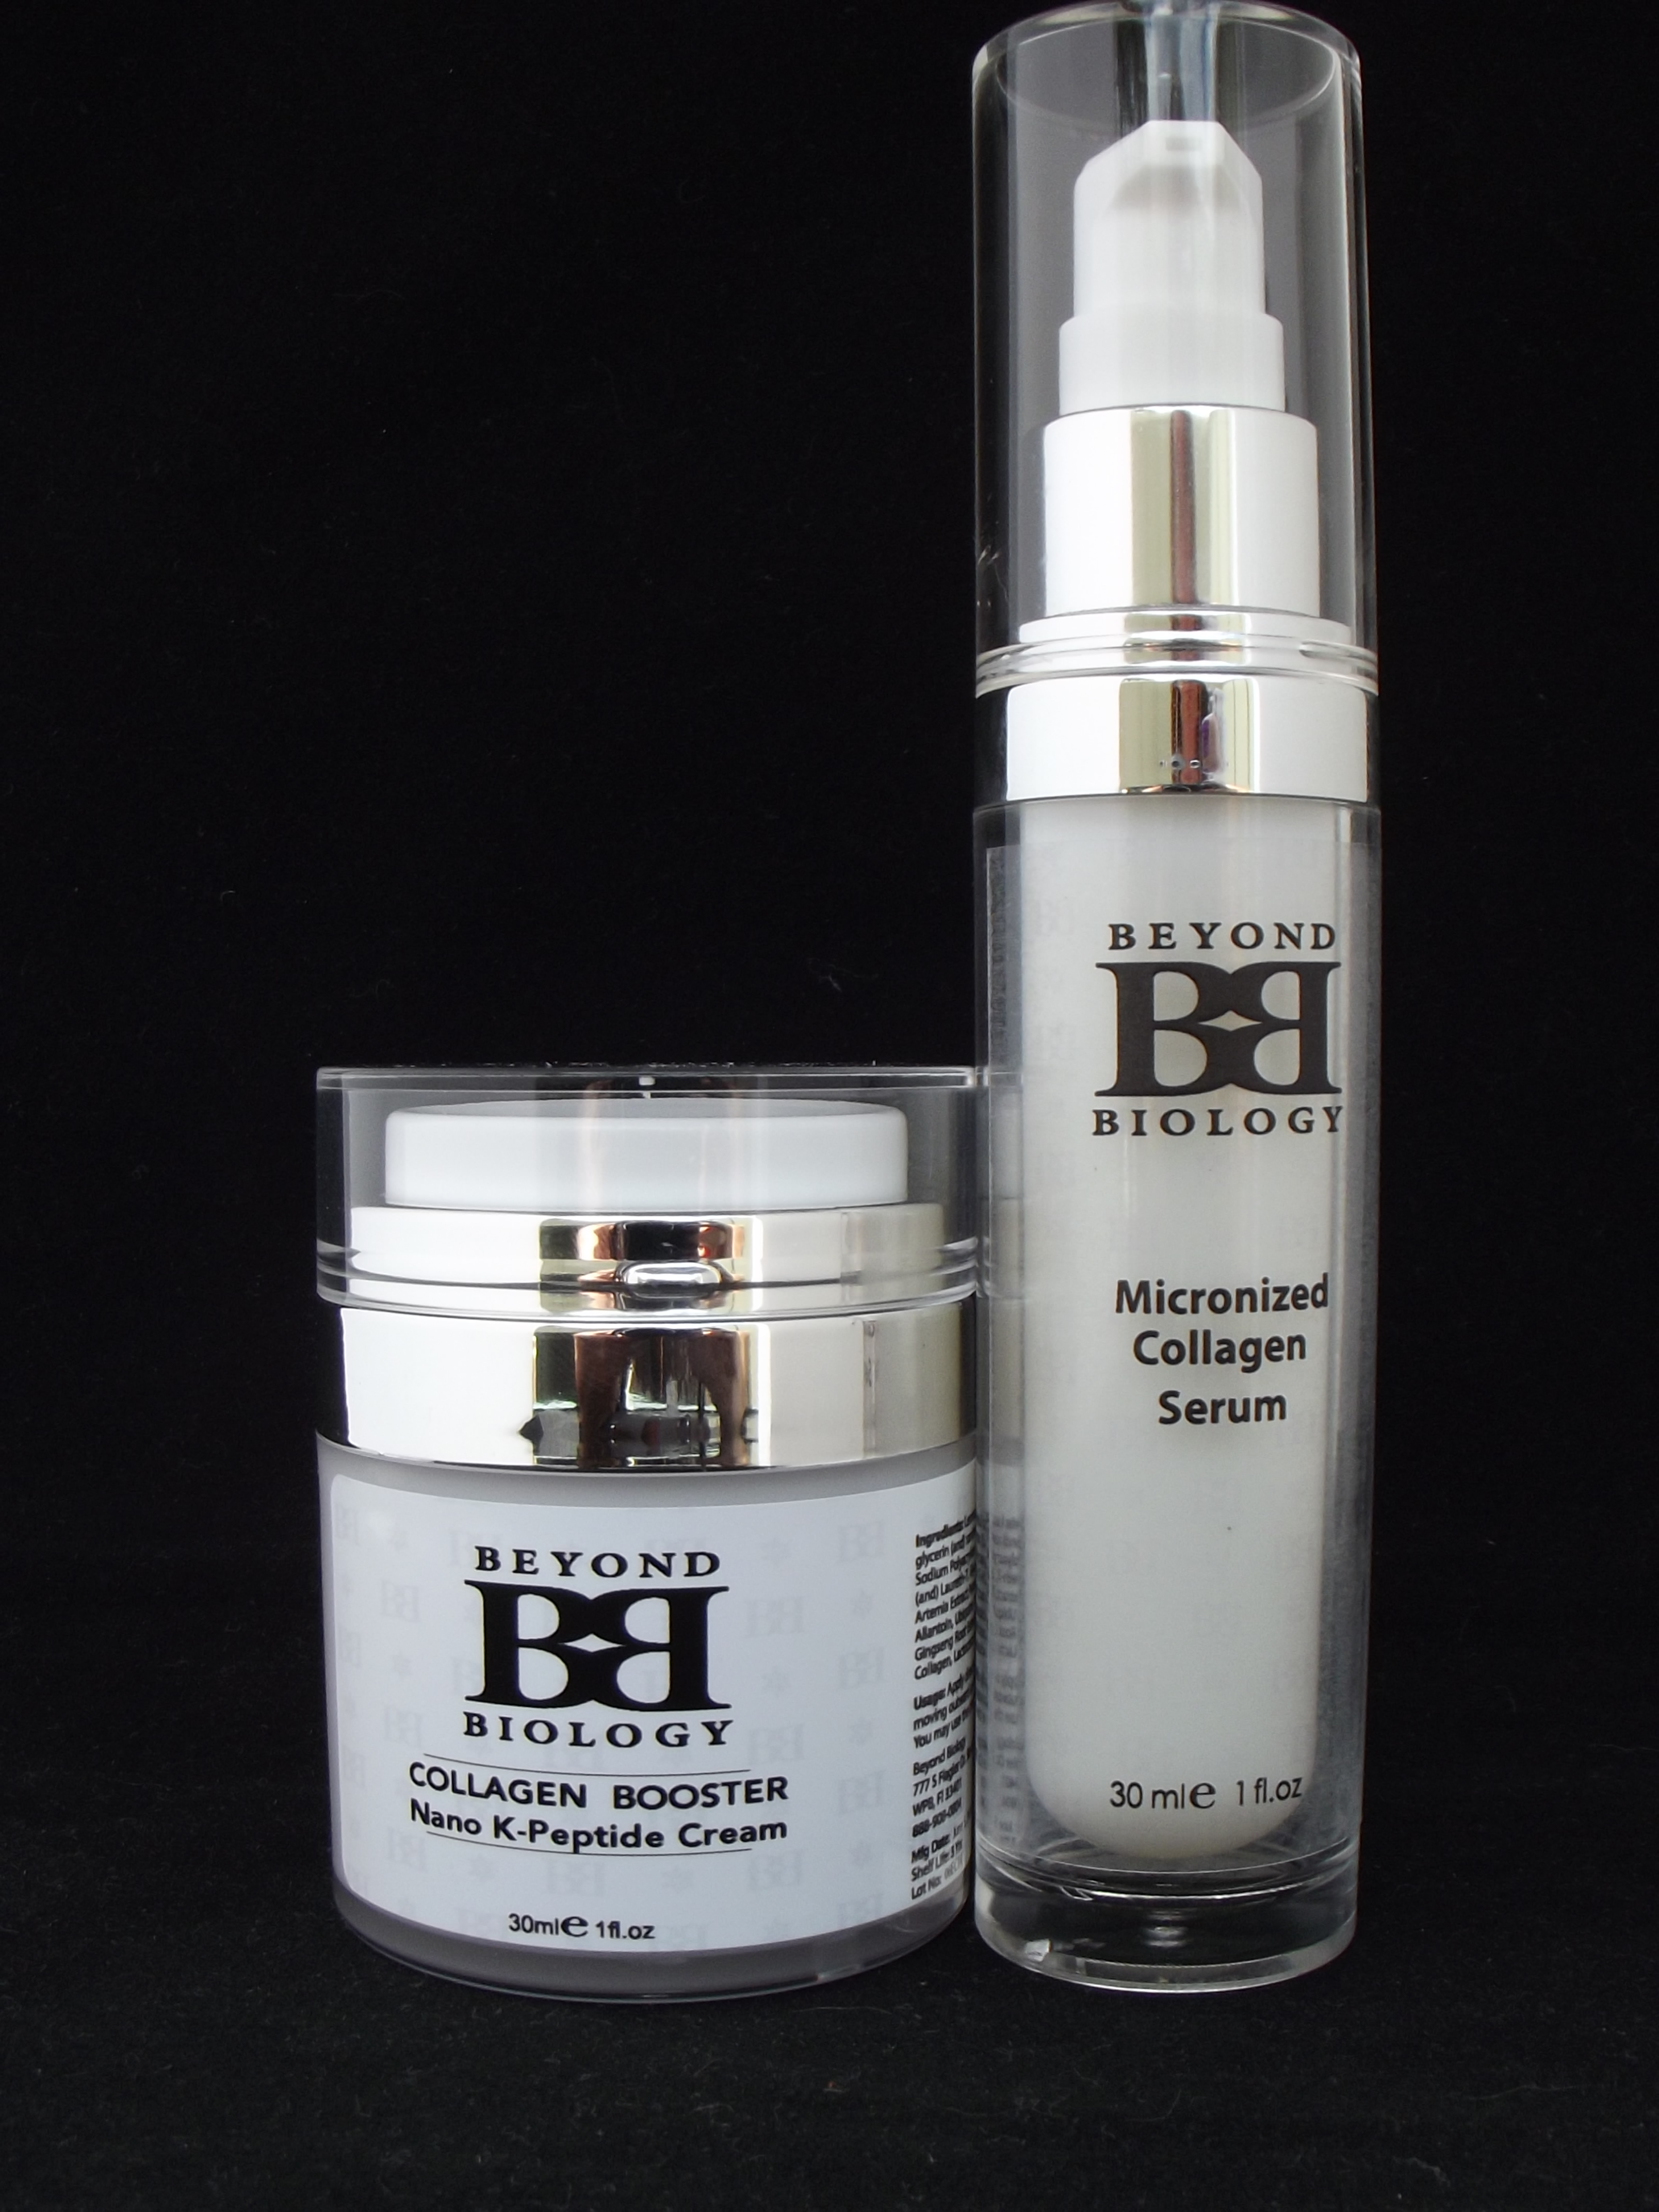 Skin Care Duo Micronized Collagen Serum Amp Collagen Booster